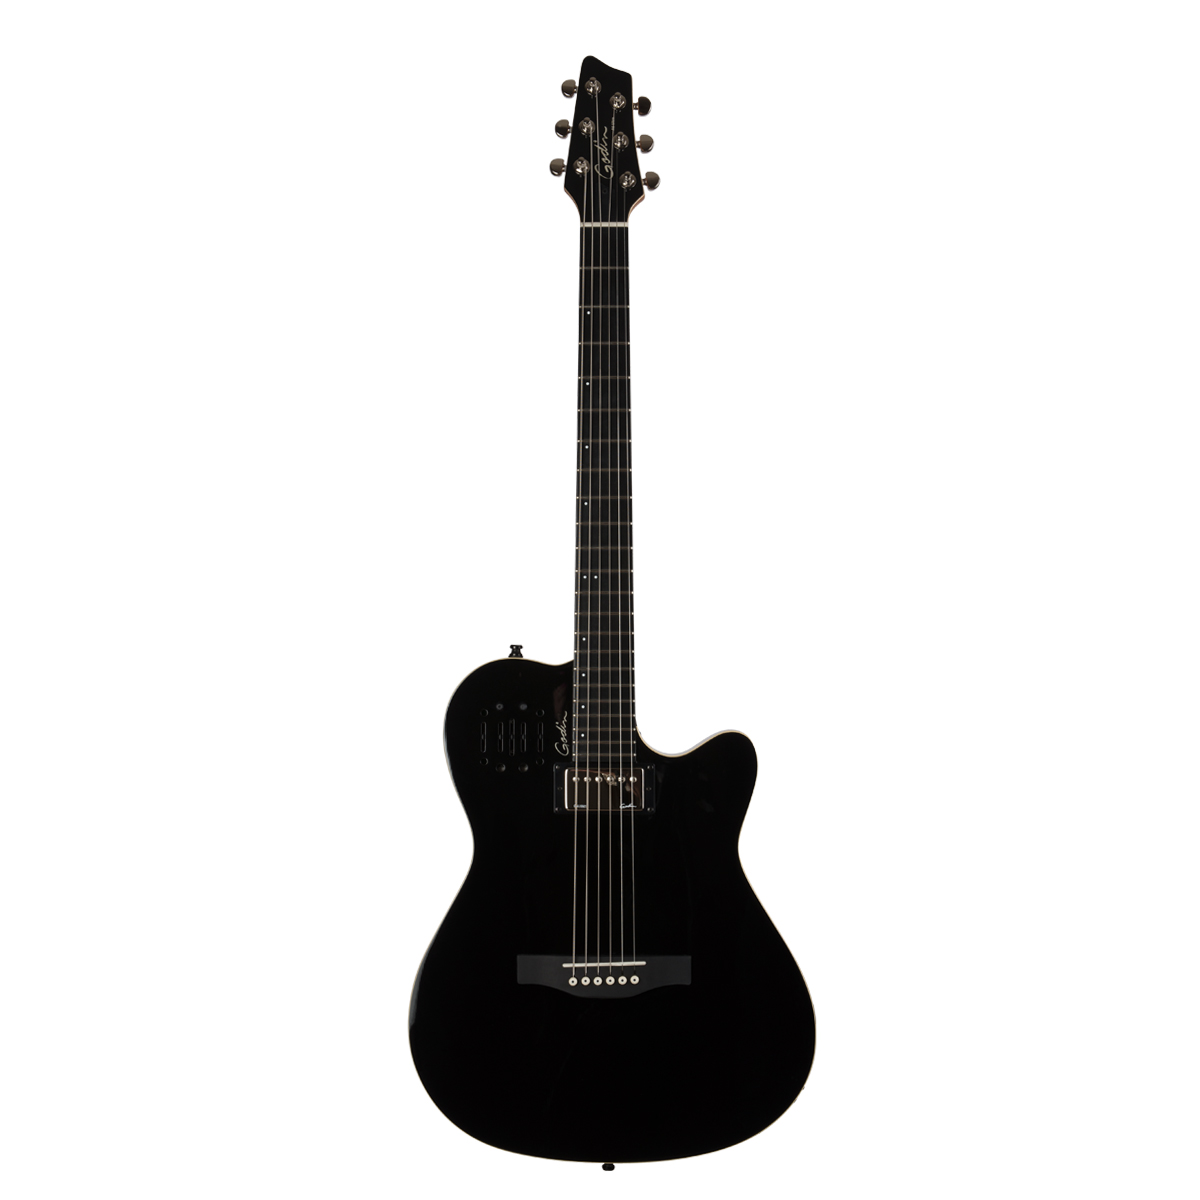 Godin 30309 A6 Ultra Black Acoustic Electric Guitar